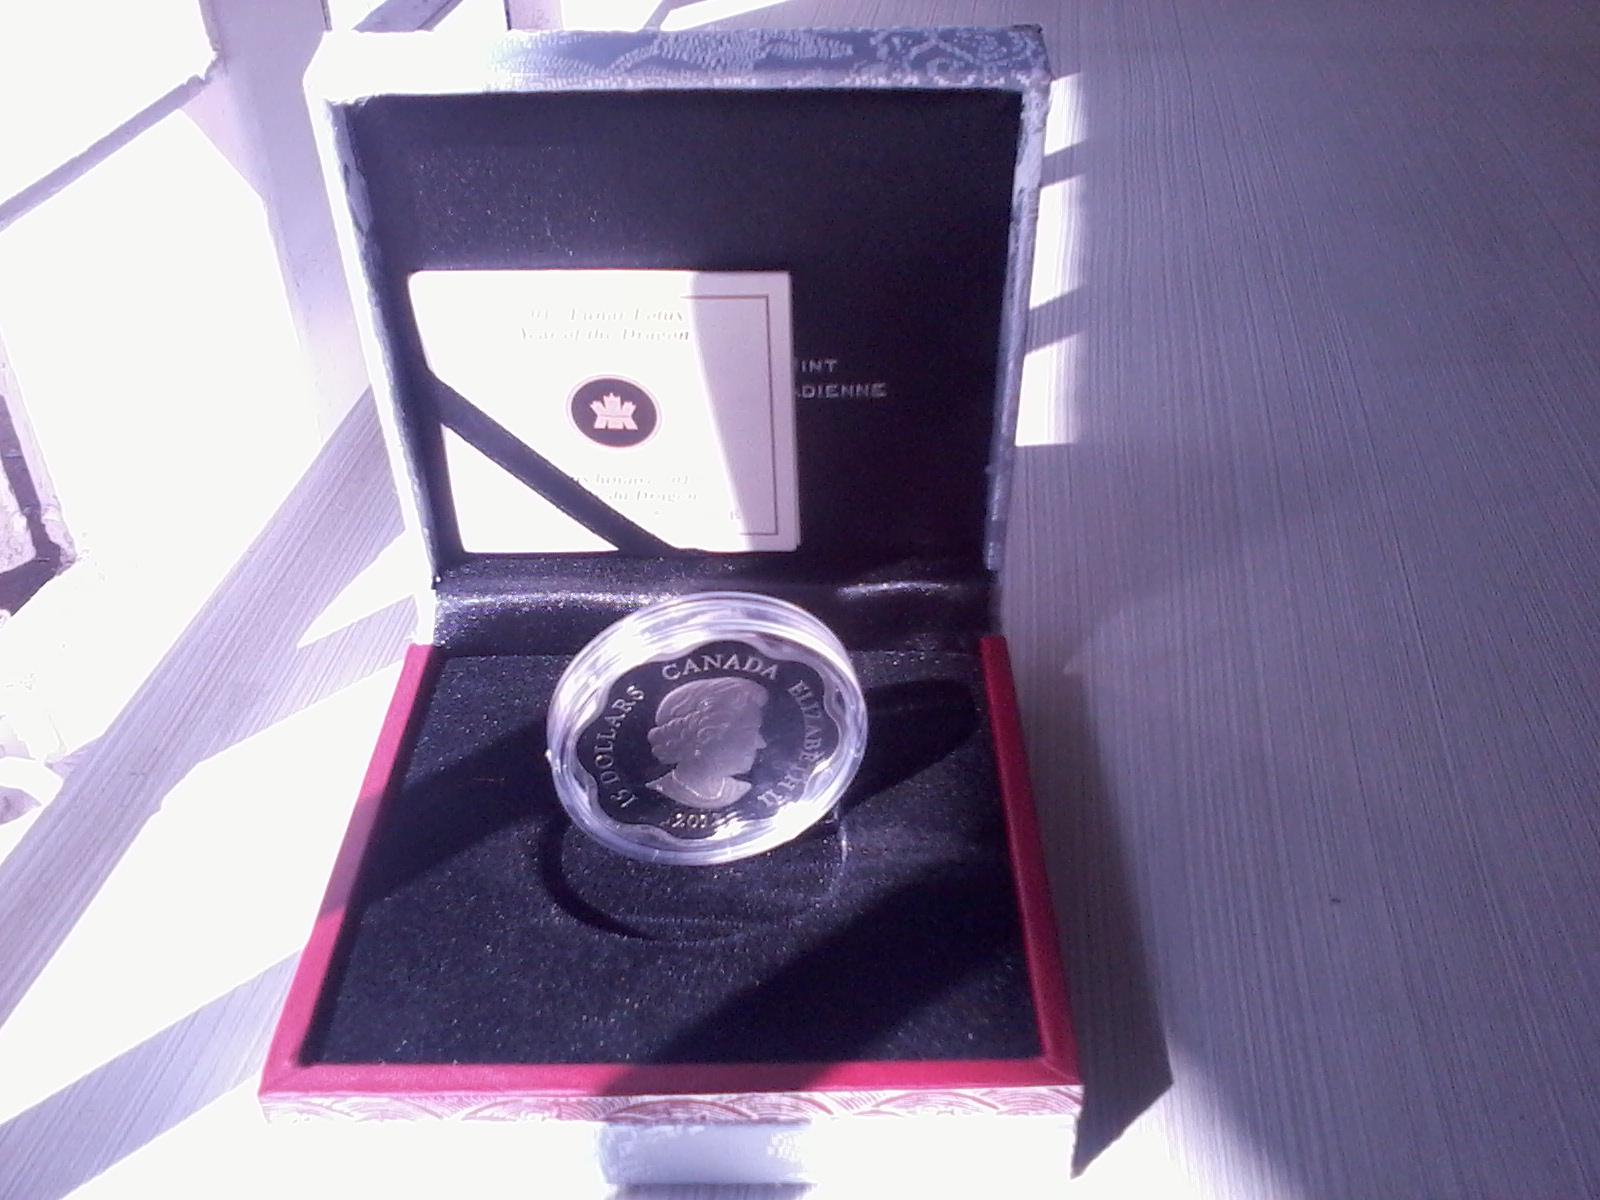 2012 $15 Lunar Lotus Year of the Dragon